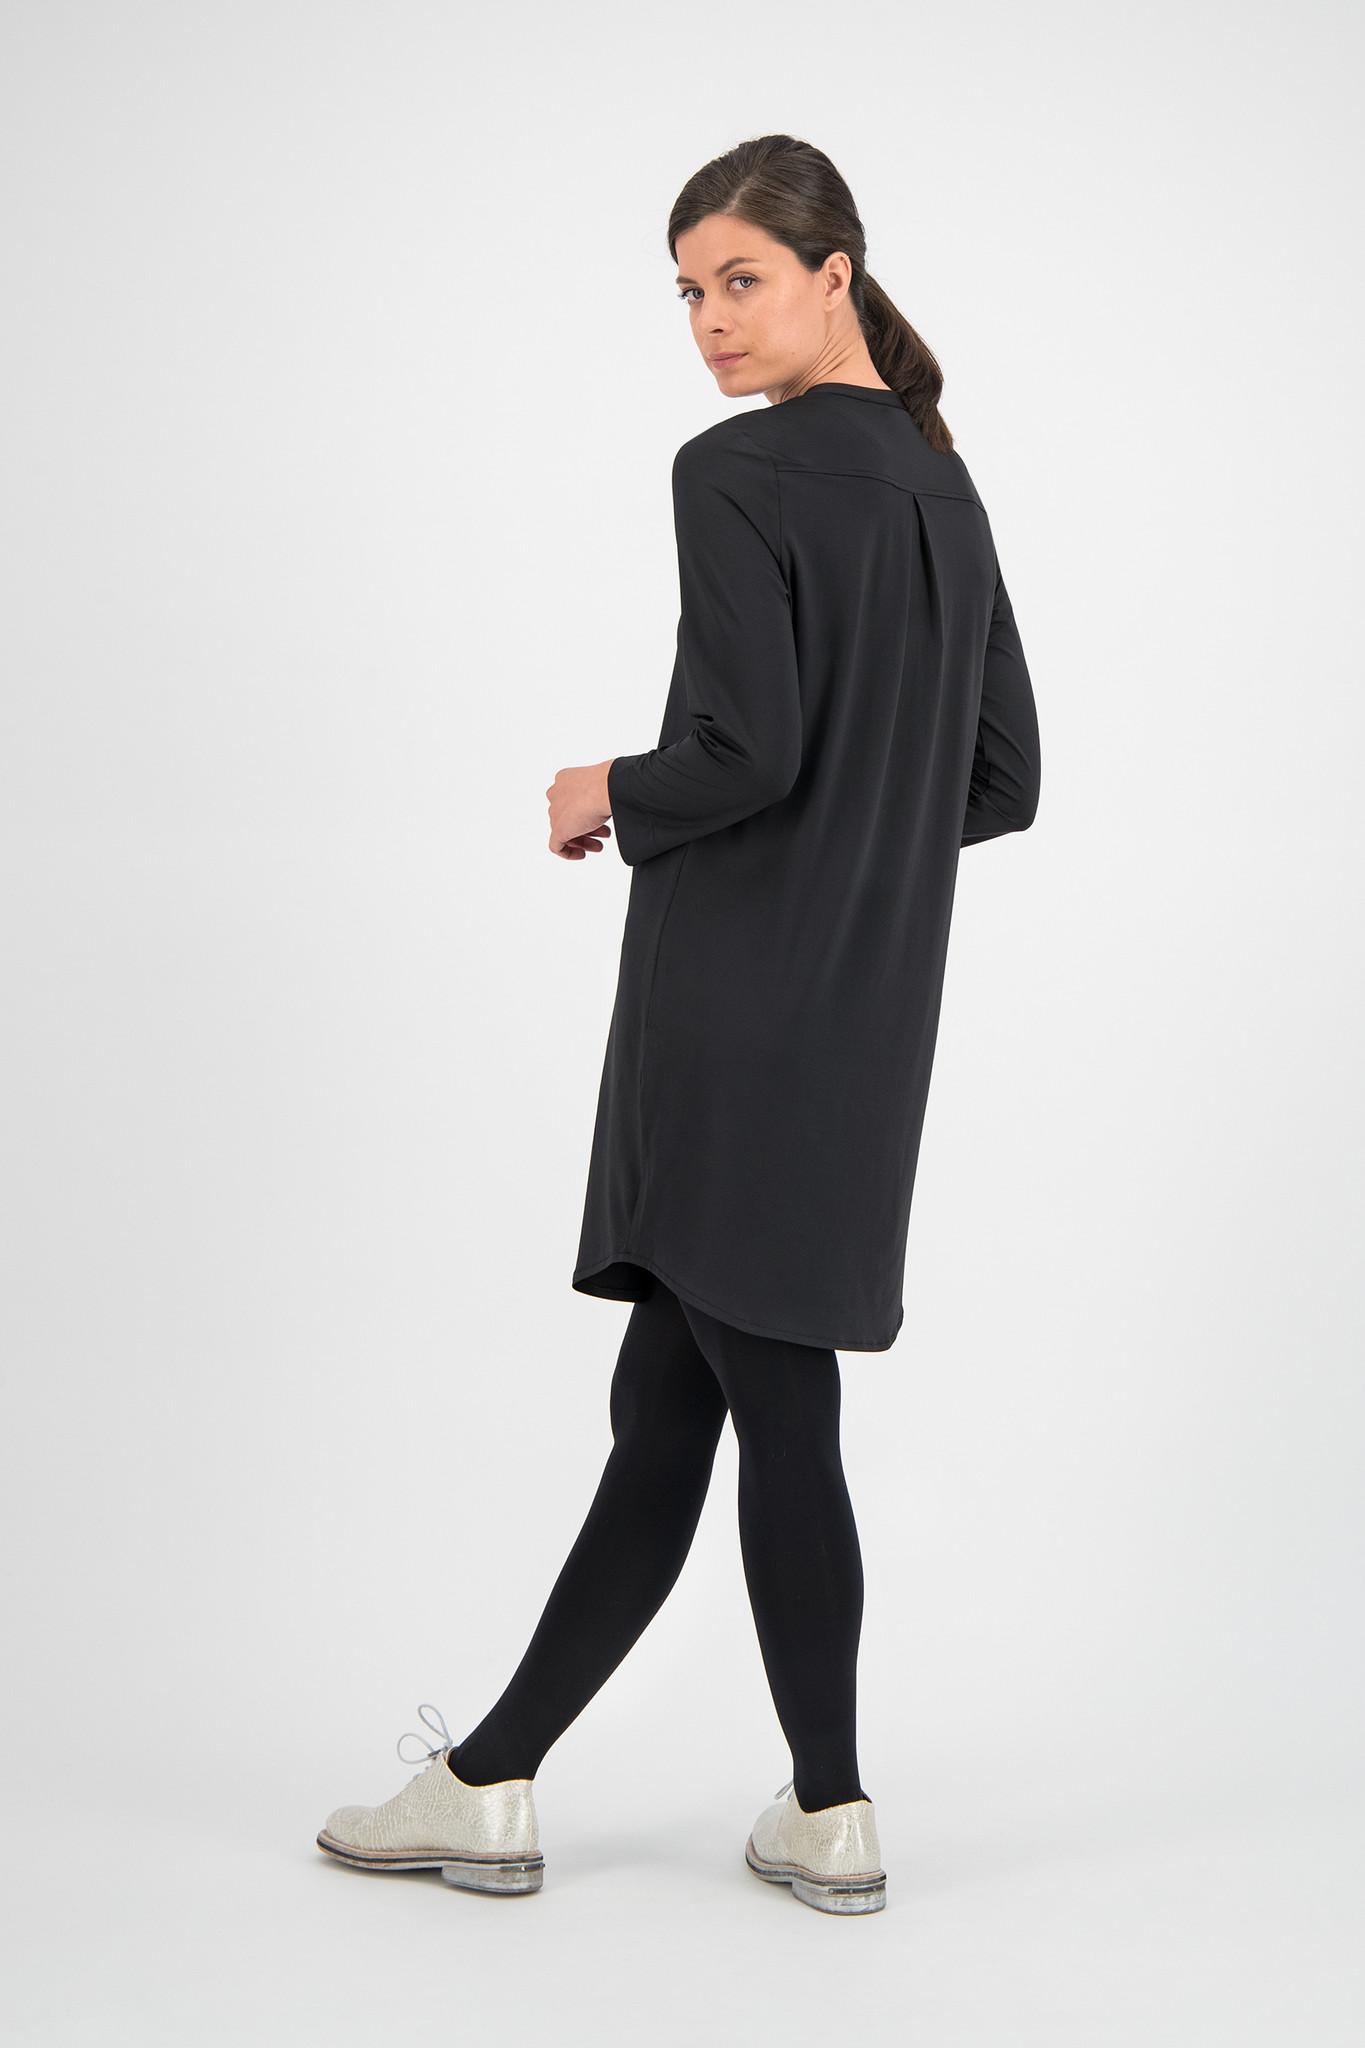 SYLVER Silky Jersey Dress - Black